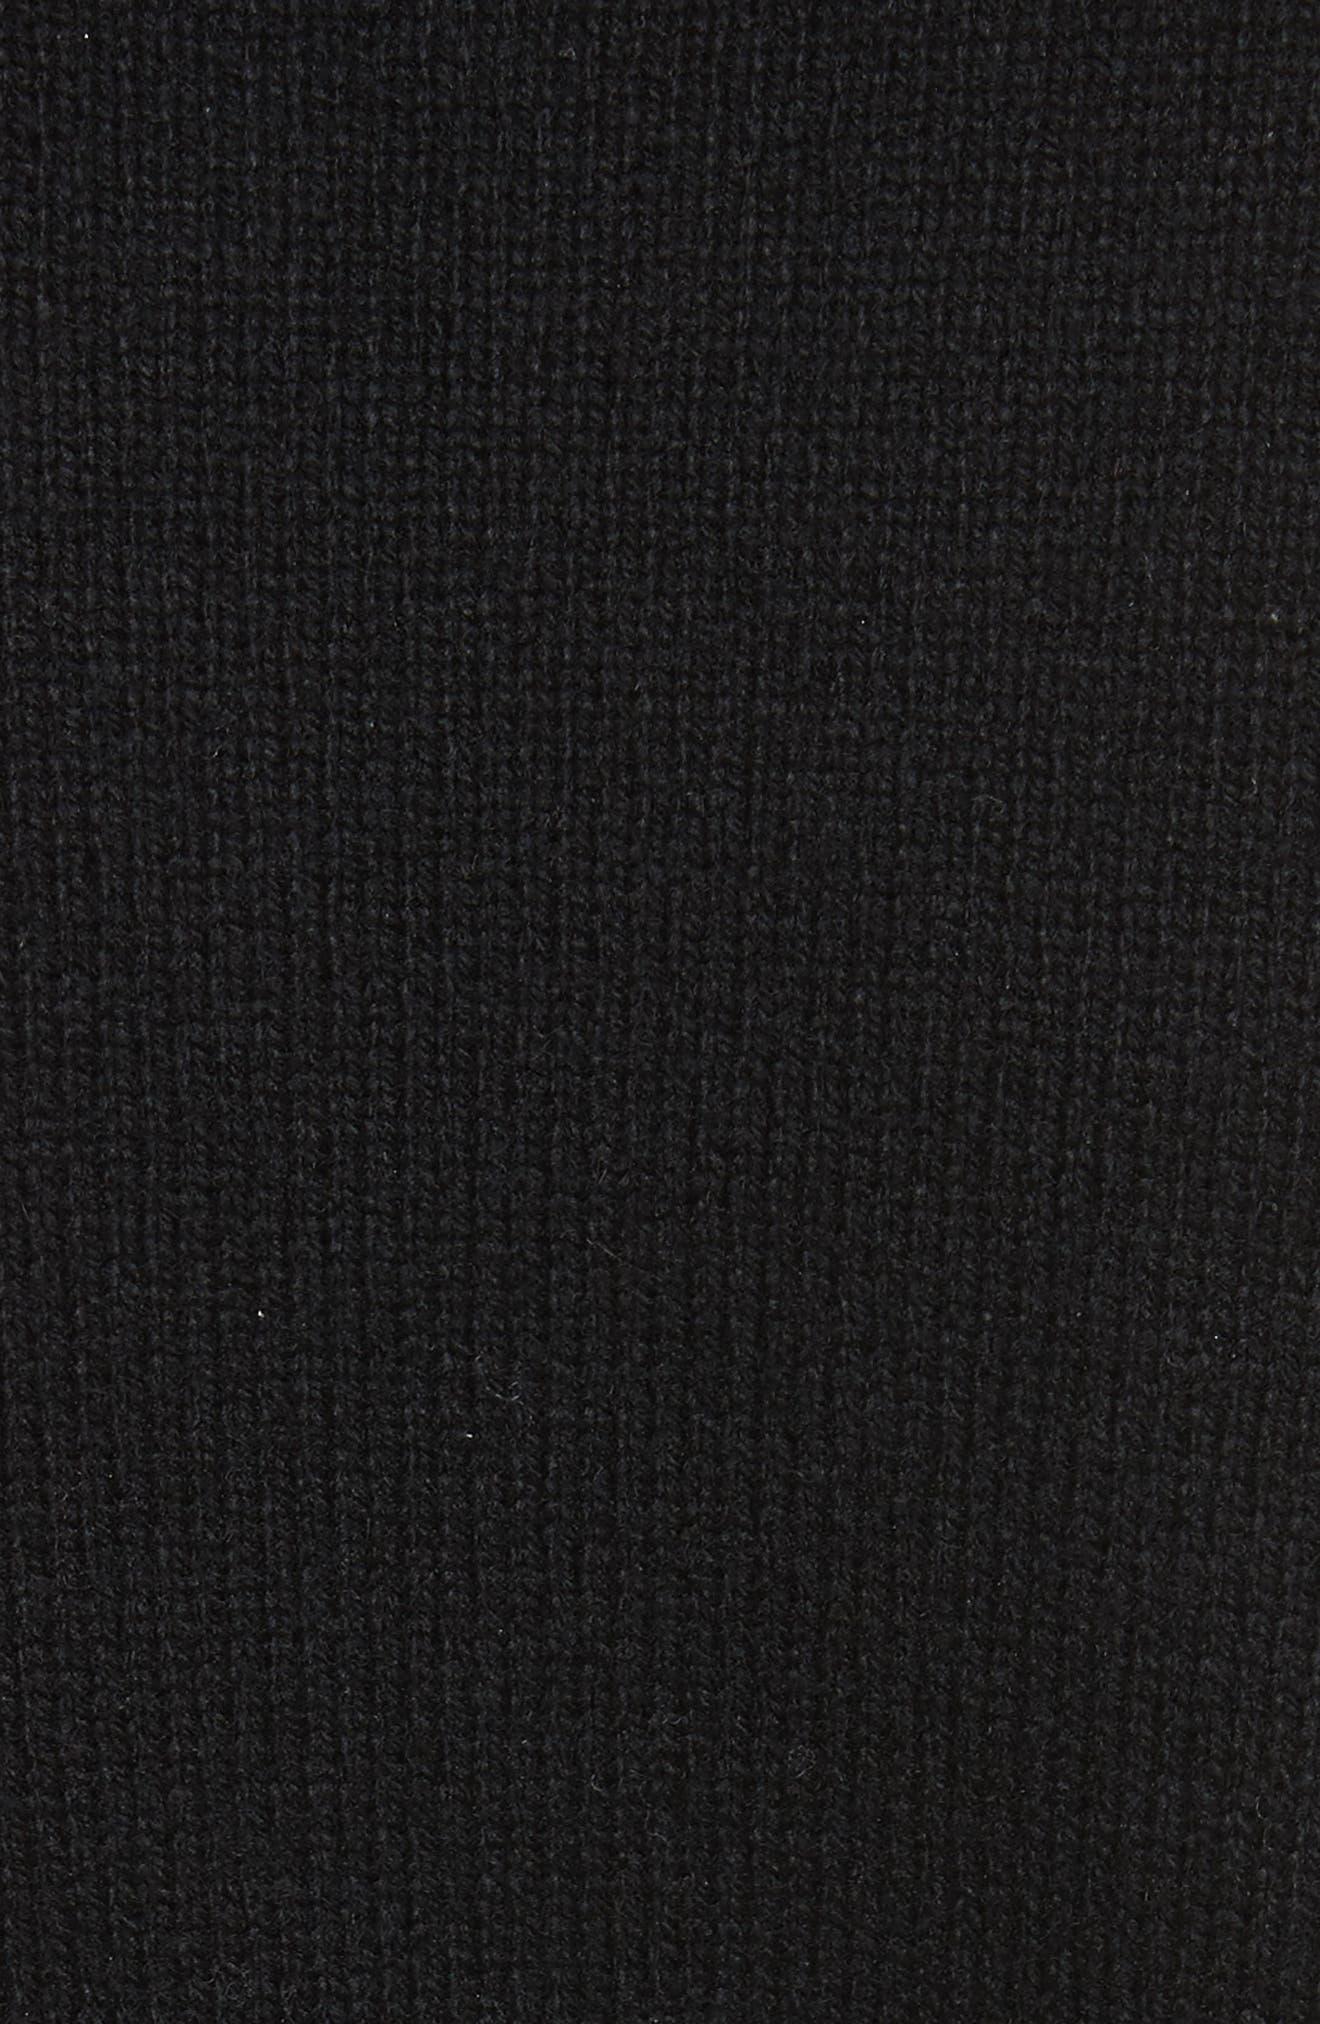 Lace Mix Cardigan,                             Alternate thumbnail 5, color,                             006